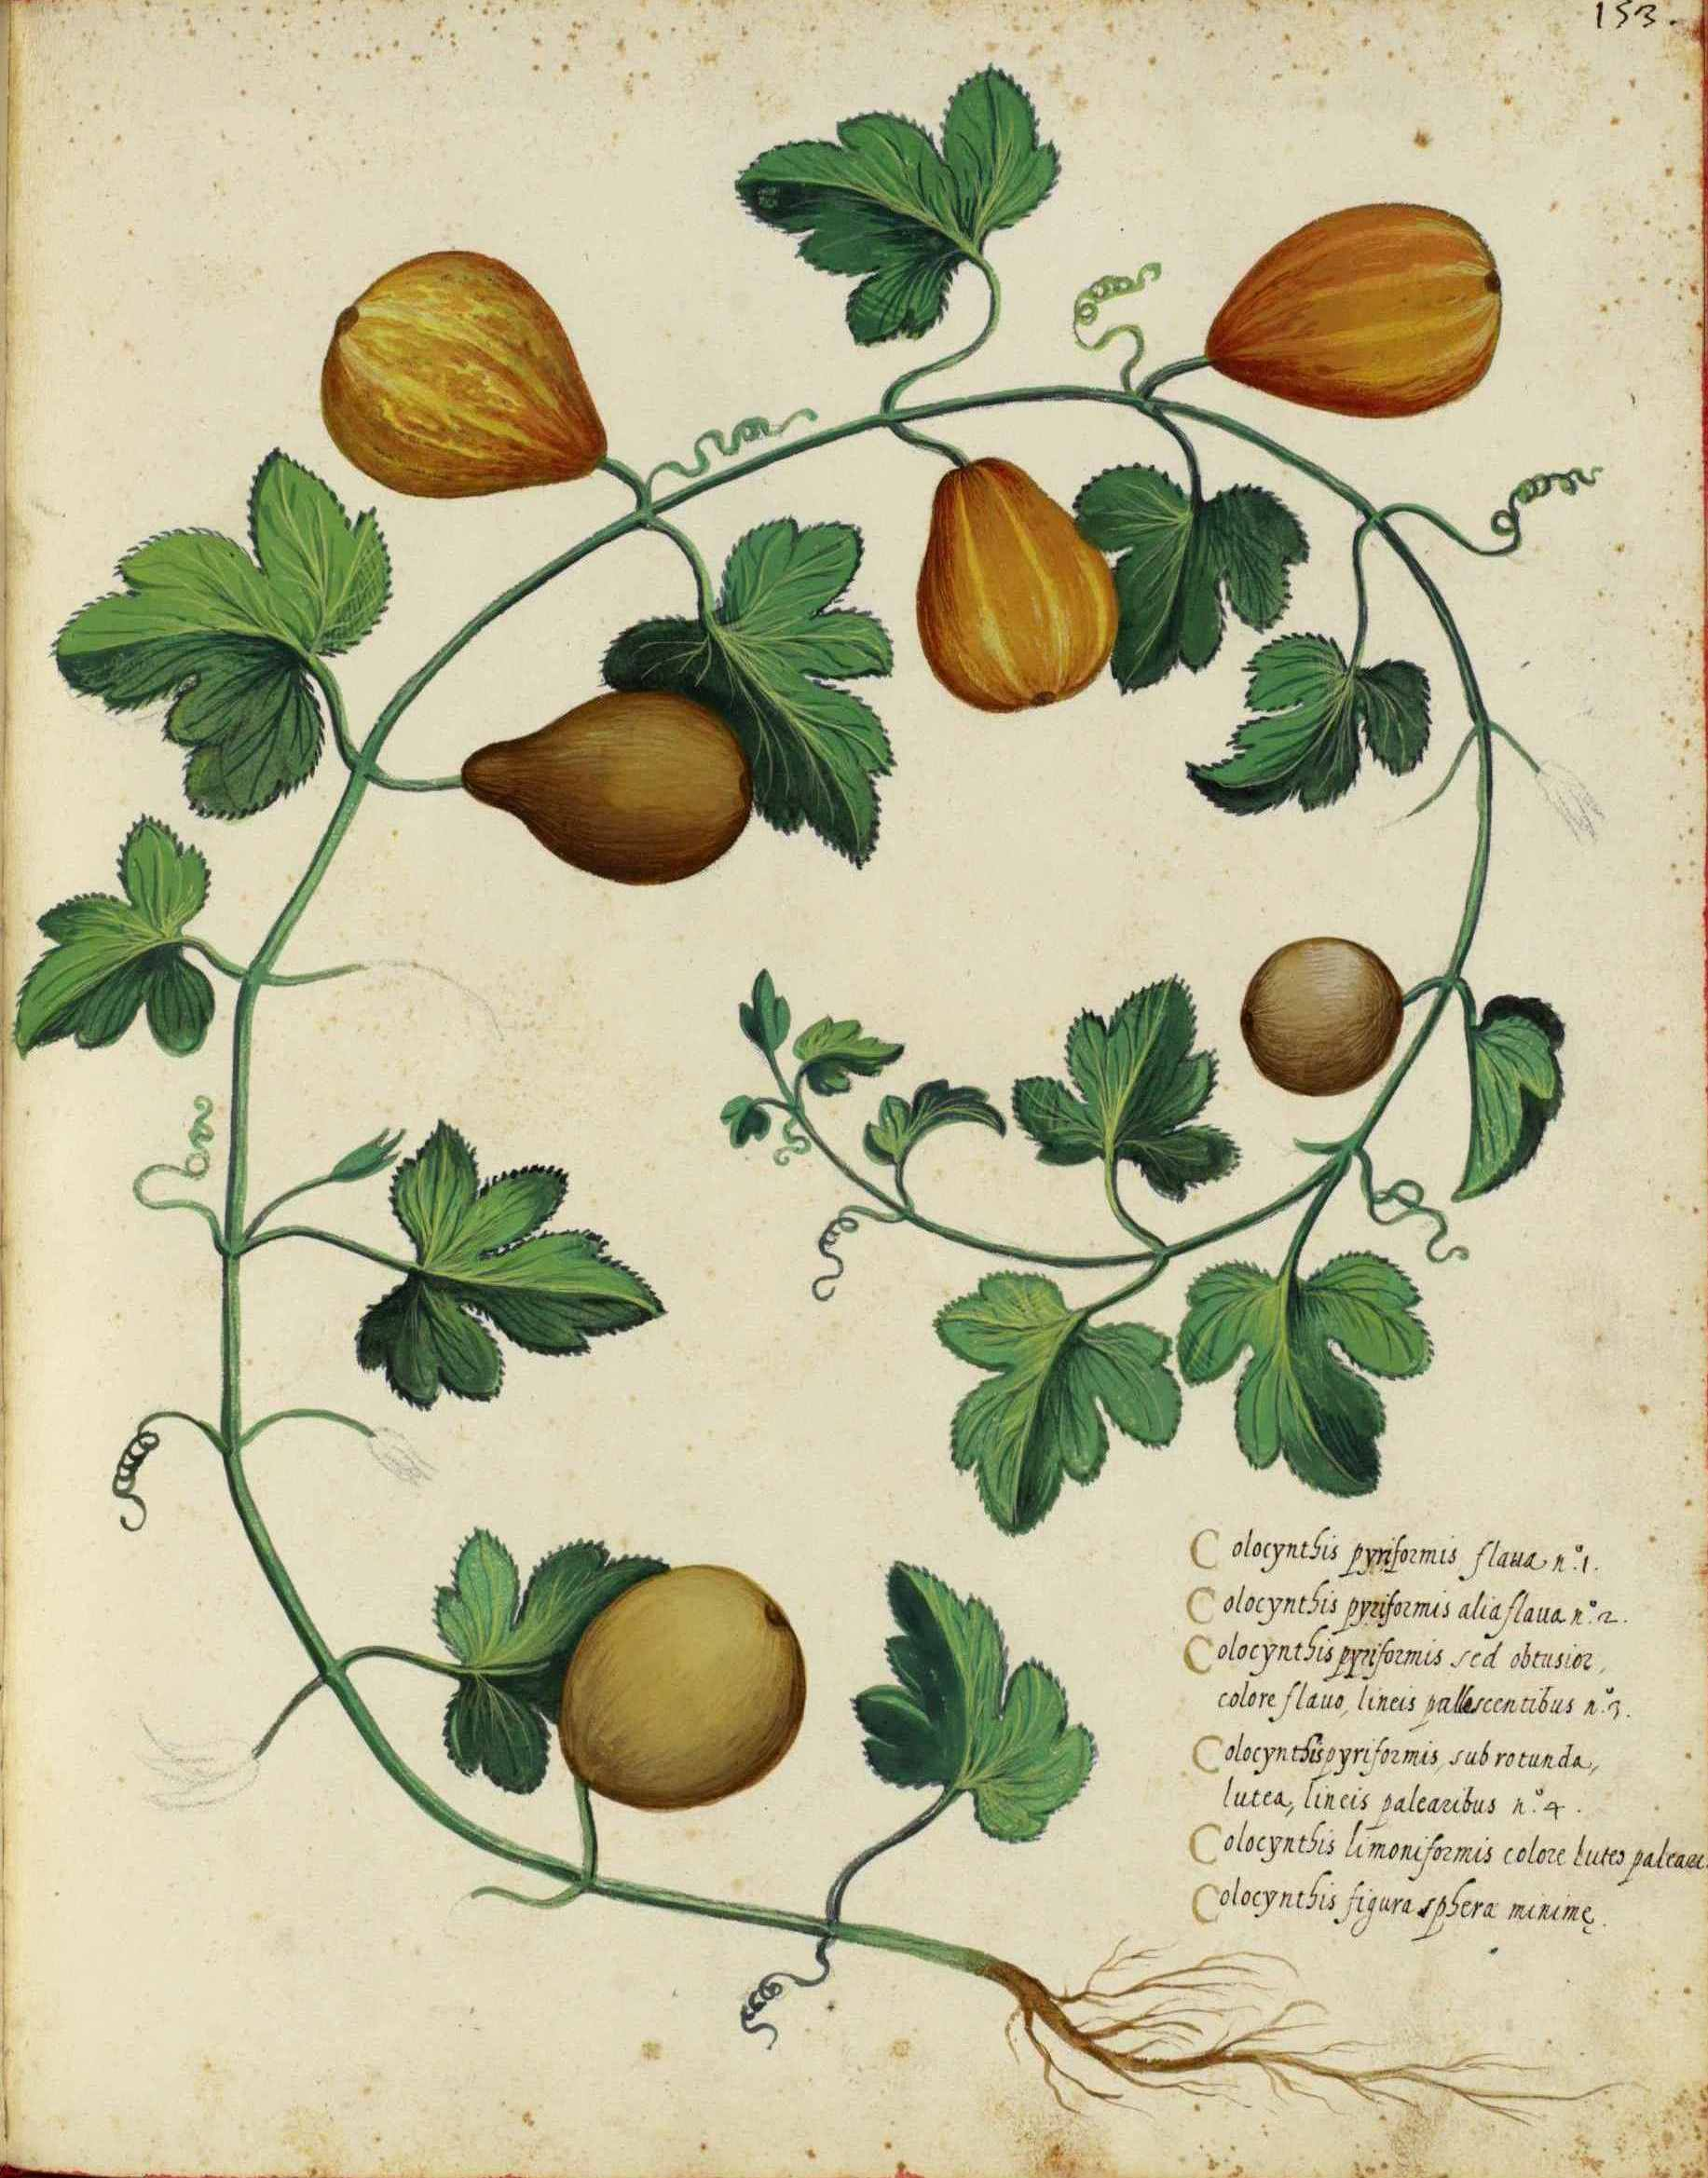 Drawn vegetable botanical illustration More 775 Flowers Member Botanical